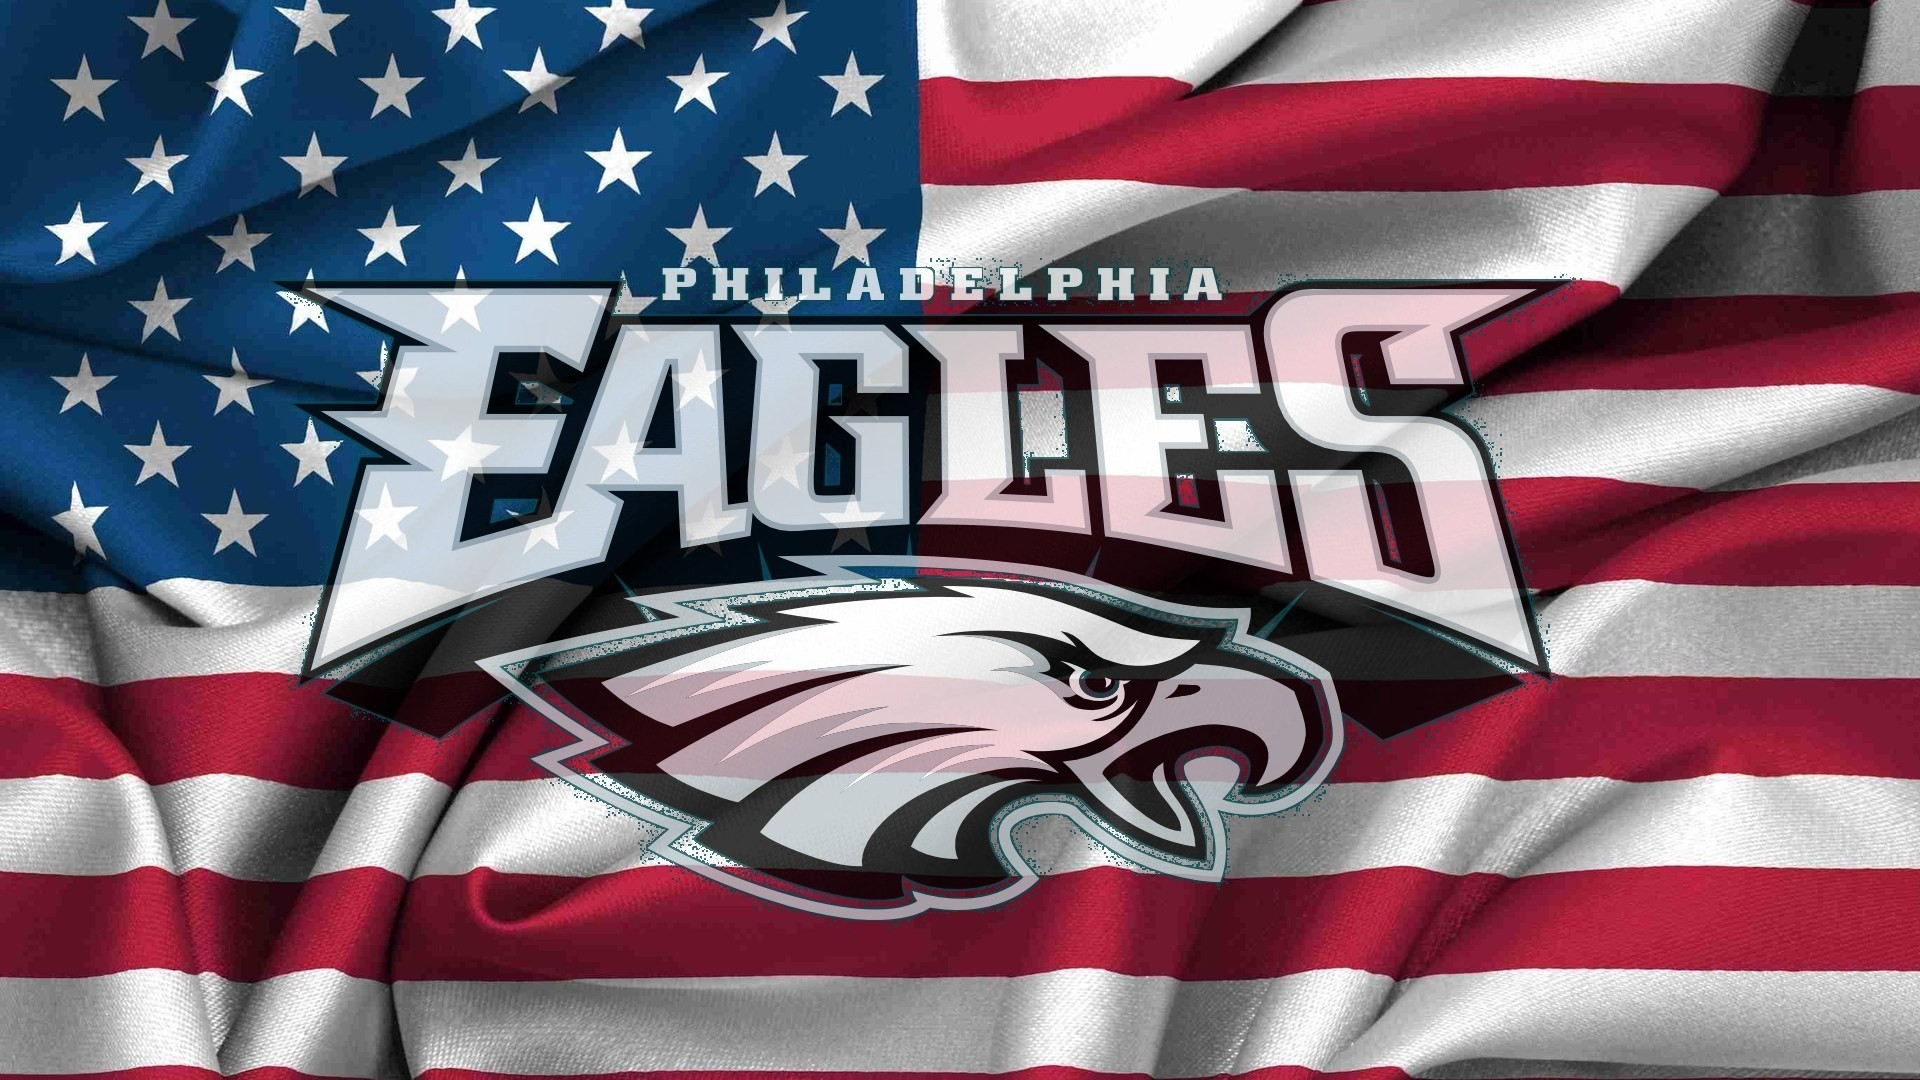 1920x1080 Wallpaper Wiki Best Philadelphia Eagles Wallpapers Pic Wpe001965